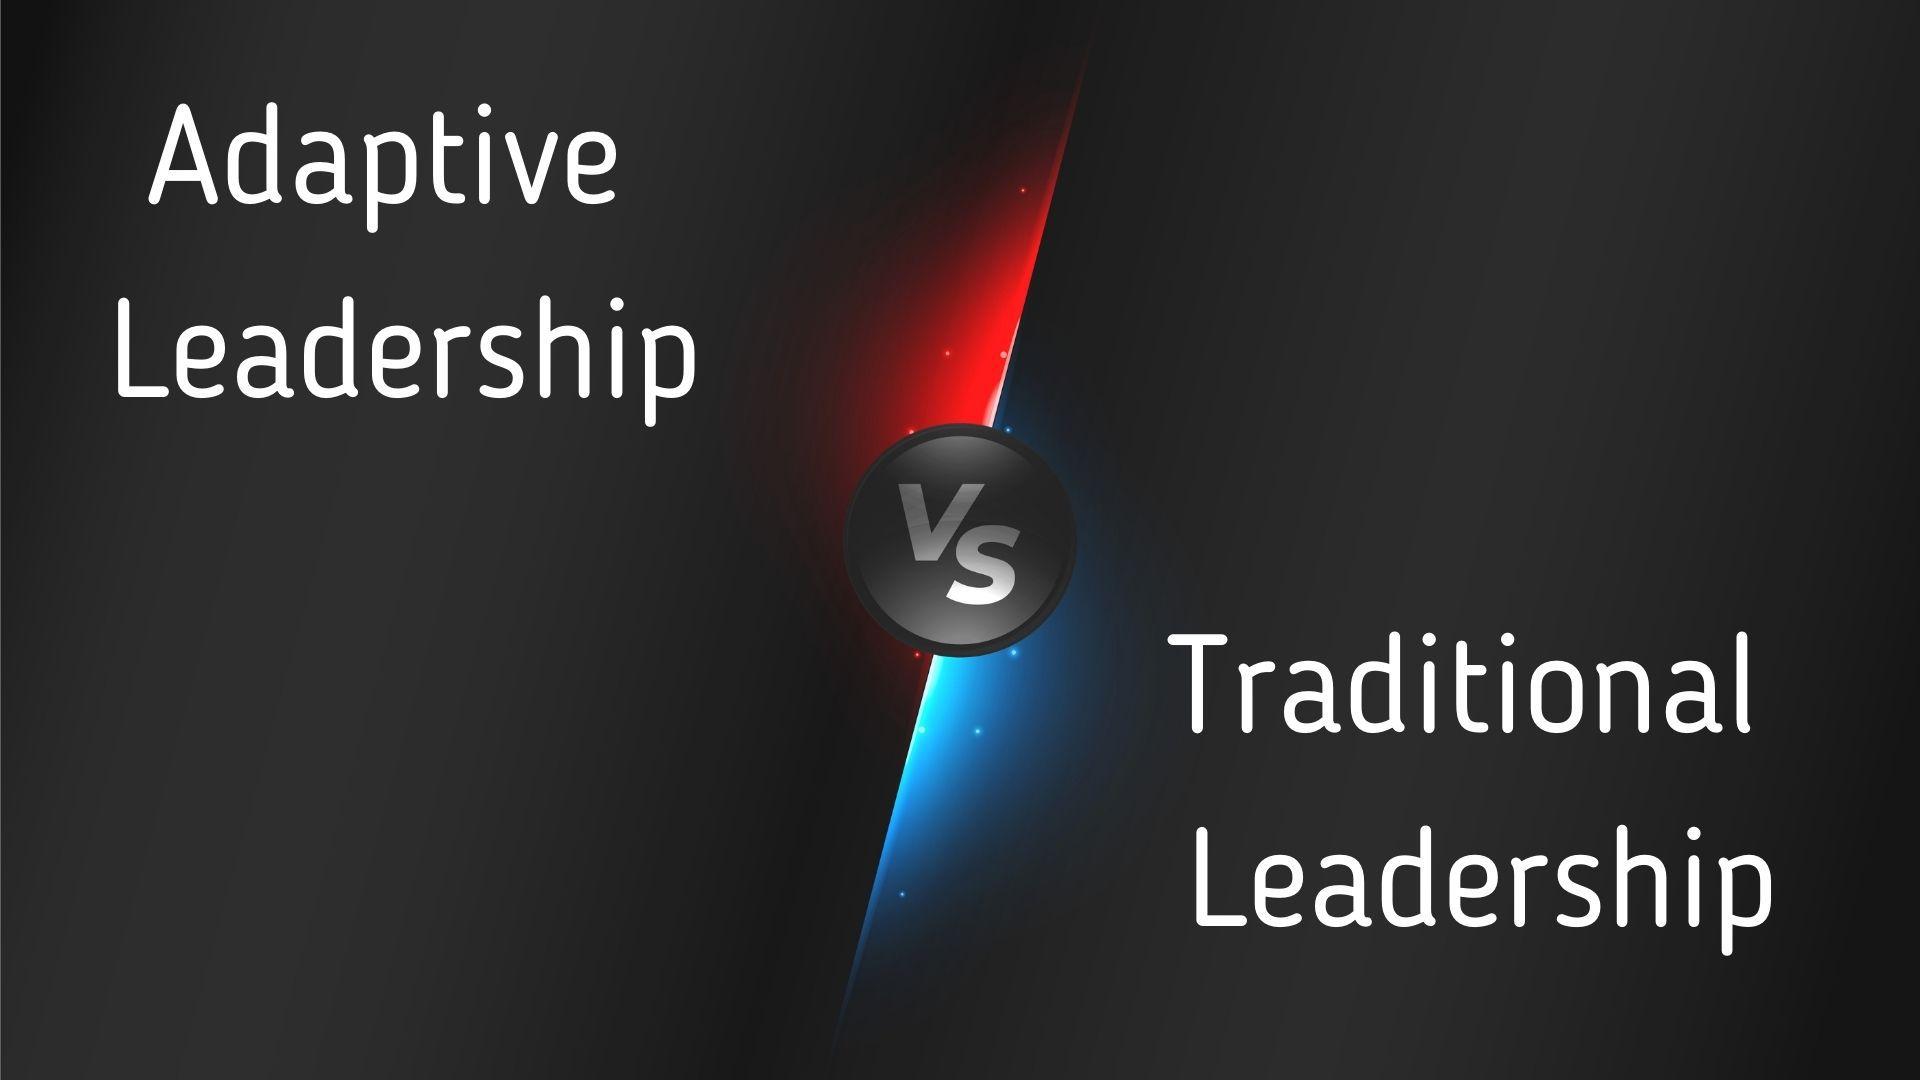 Adaptive Leadership vs. Traditional Leadership